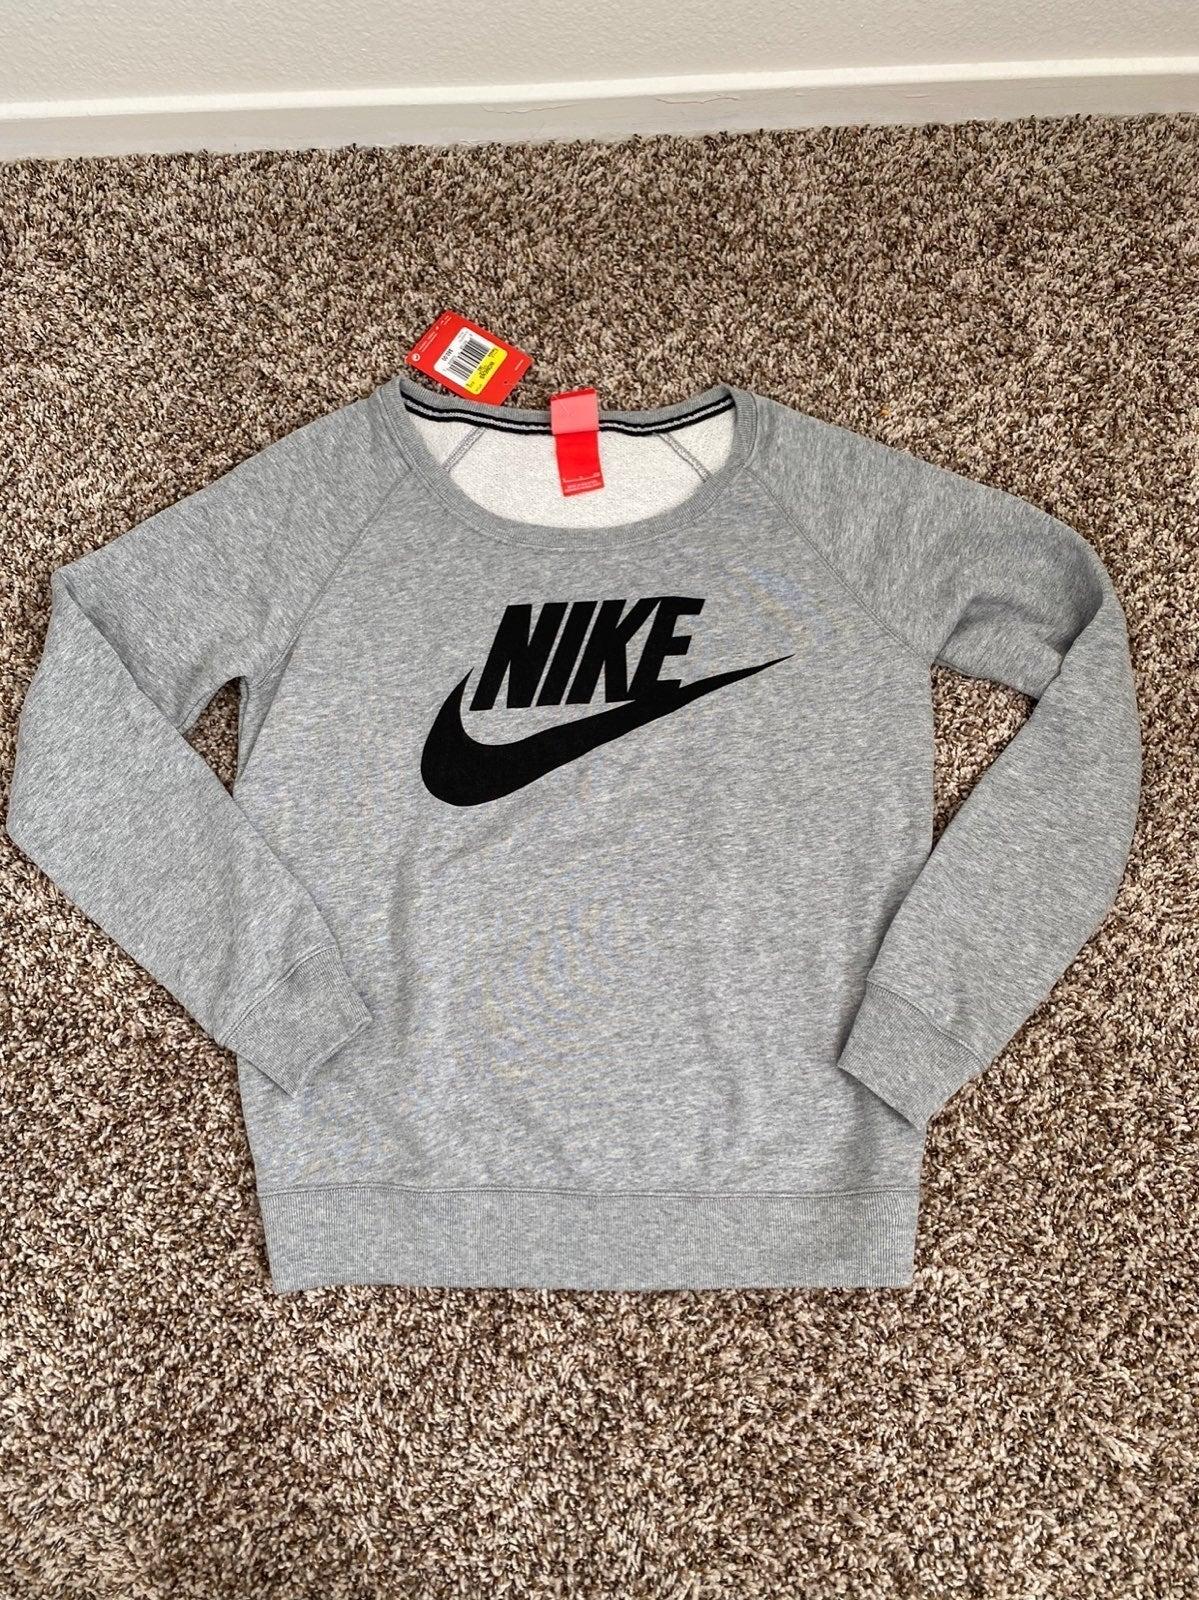 Nike Womens Sweatshirt Grey Small